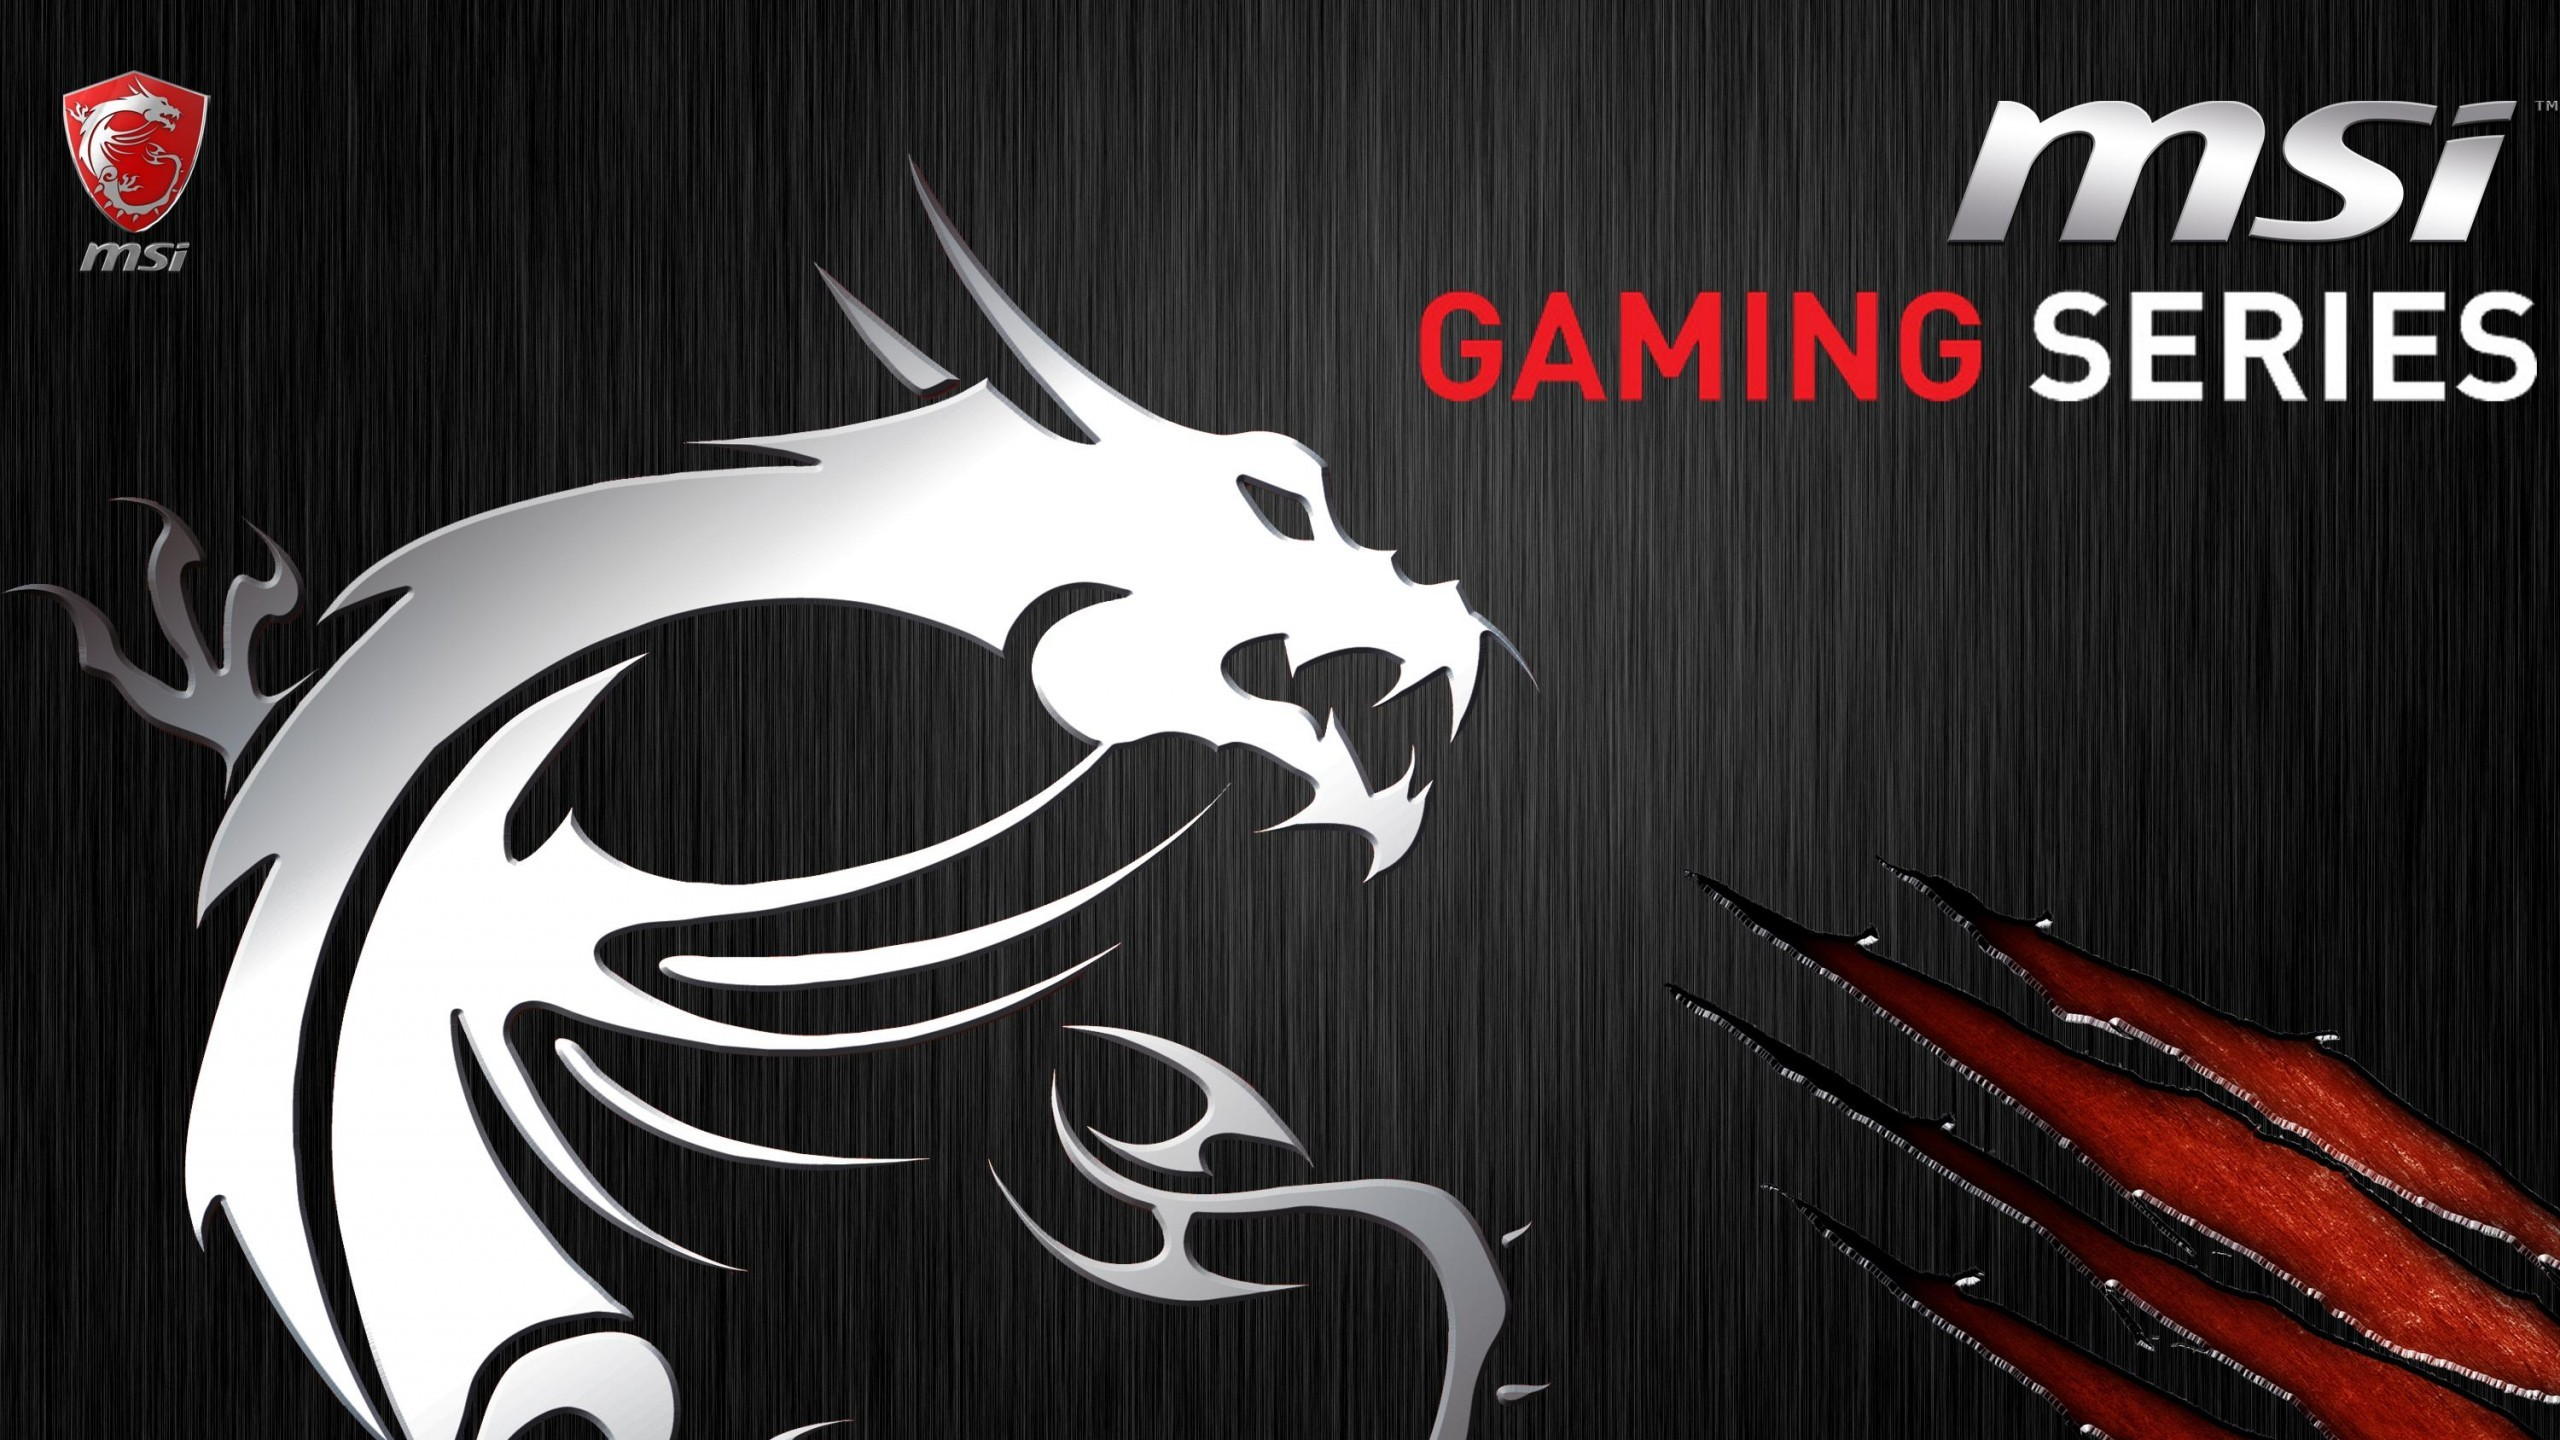 … msi gaming wallpaper wallpaper hddesktops com high …